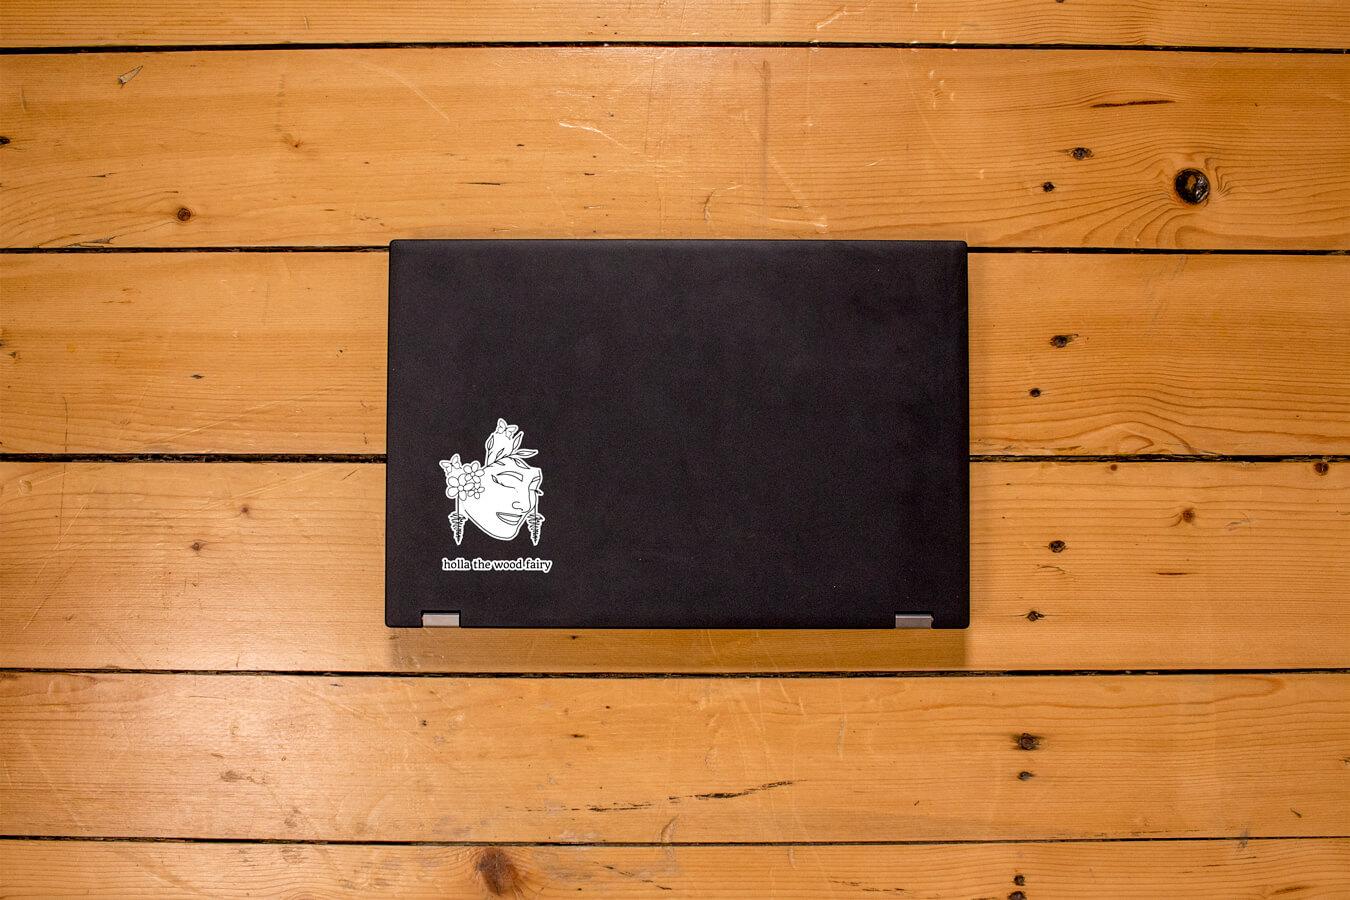 Produktbild Sticker holla the wood fairy auf Laptop